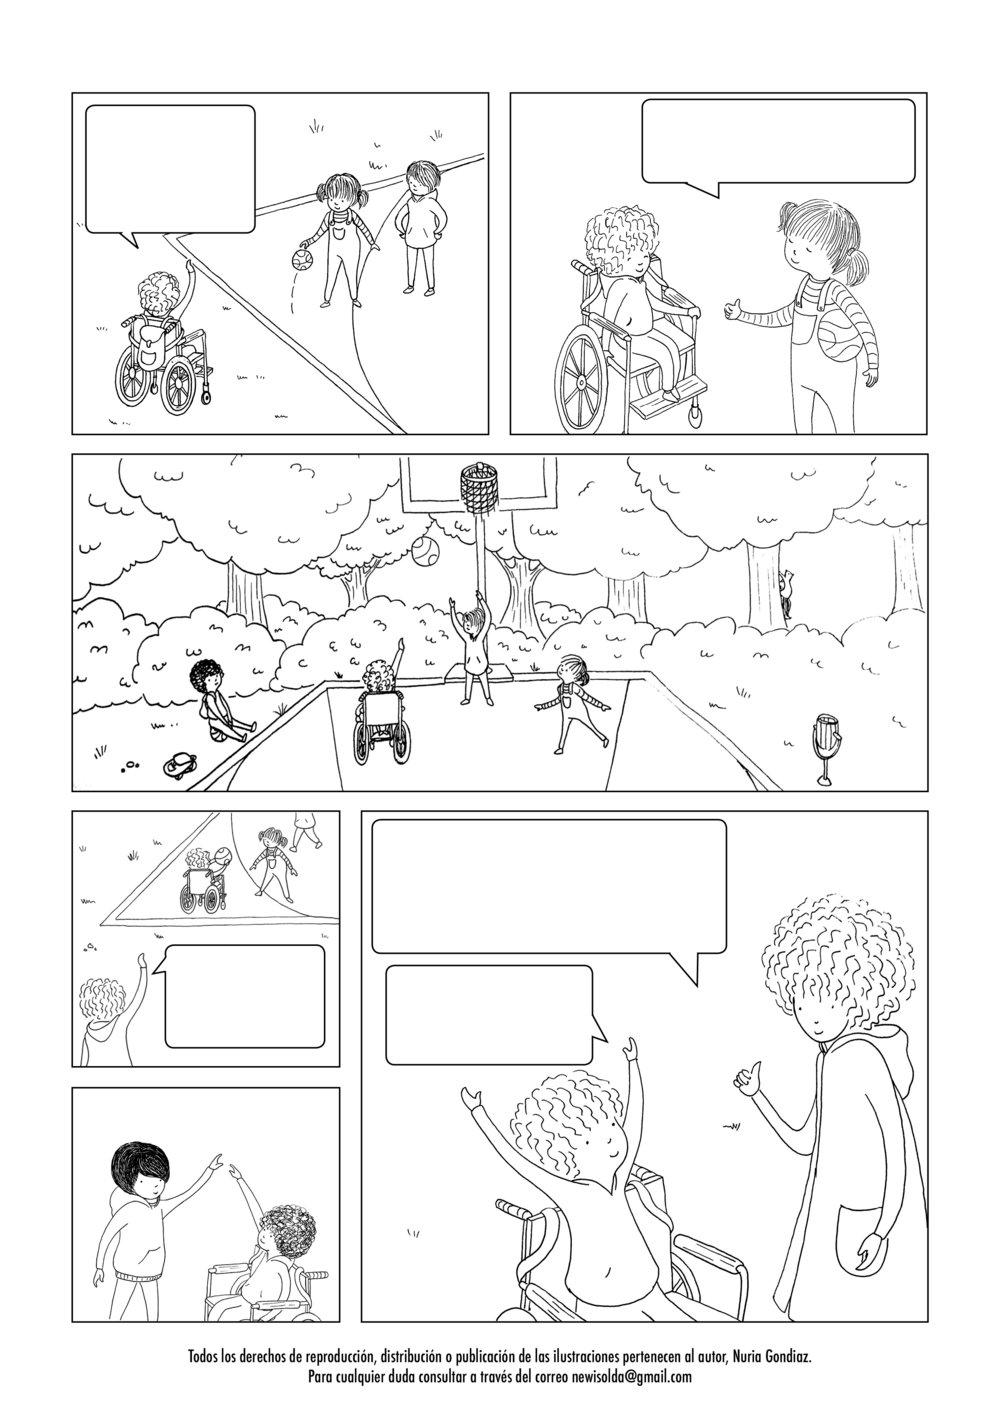 comic_integracion2.jpg